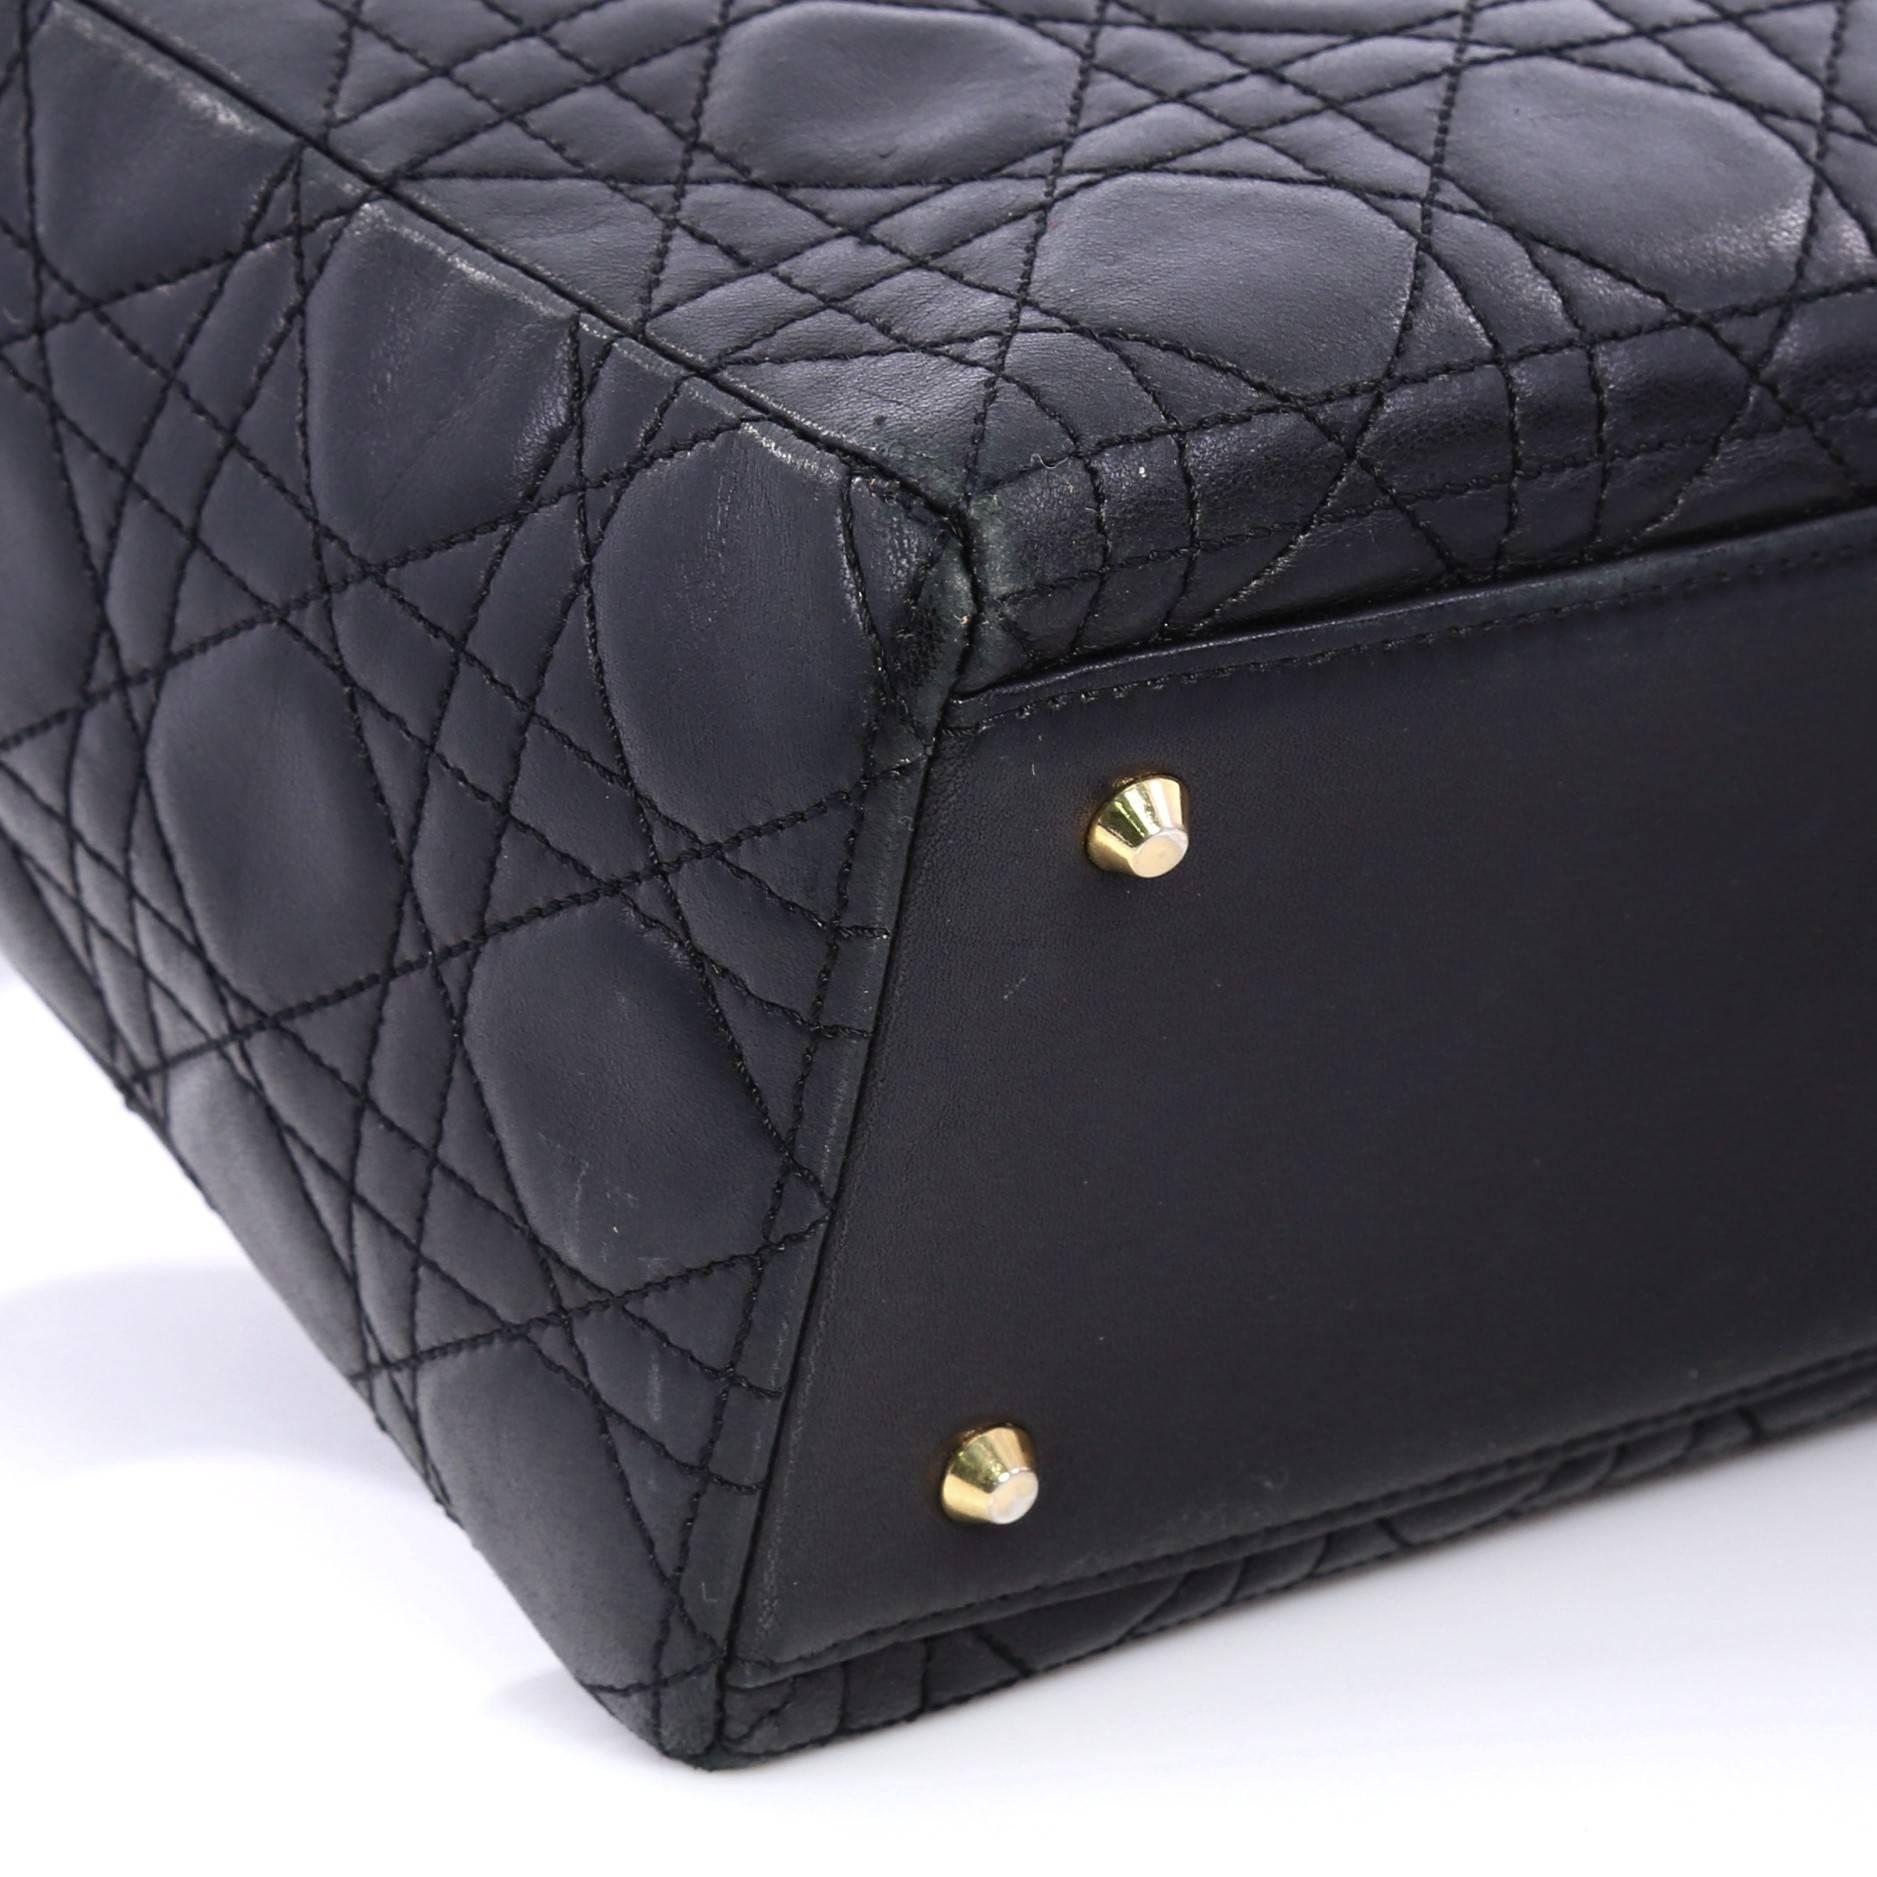 800055d05d09 Christian Dior Lady Dior Handbag Cannage Quilt Lambskin Medium at 1stdibs